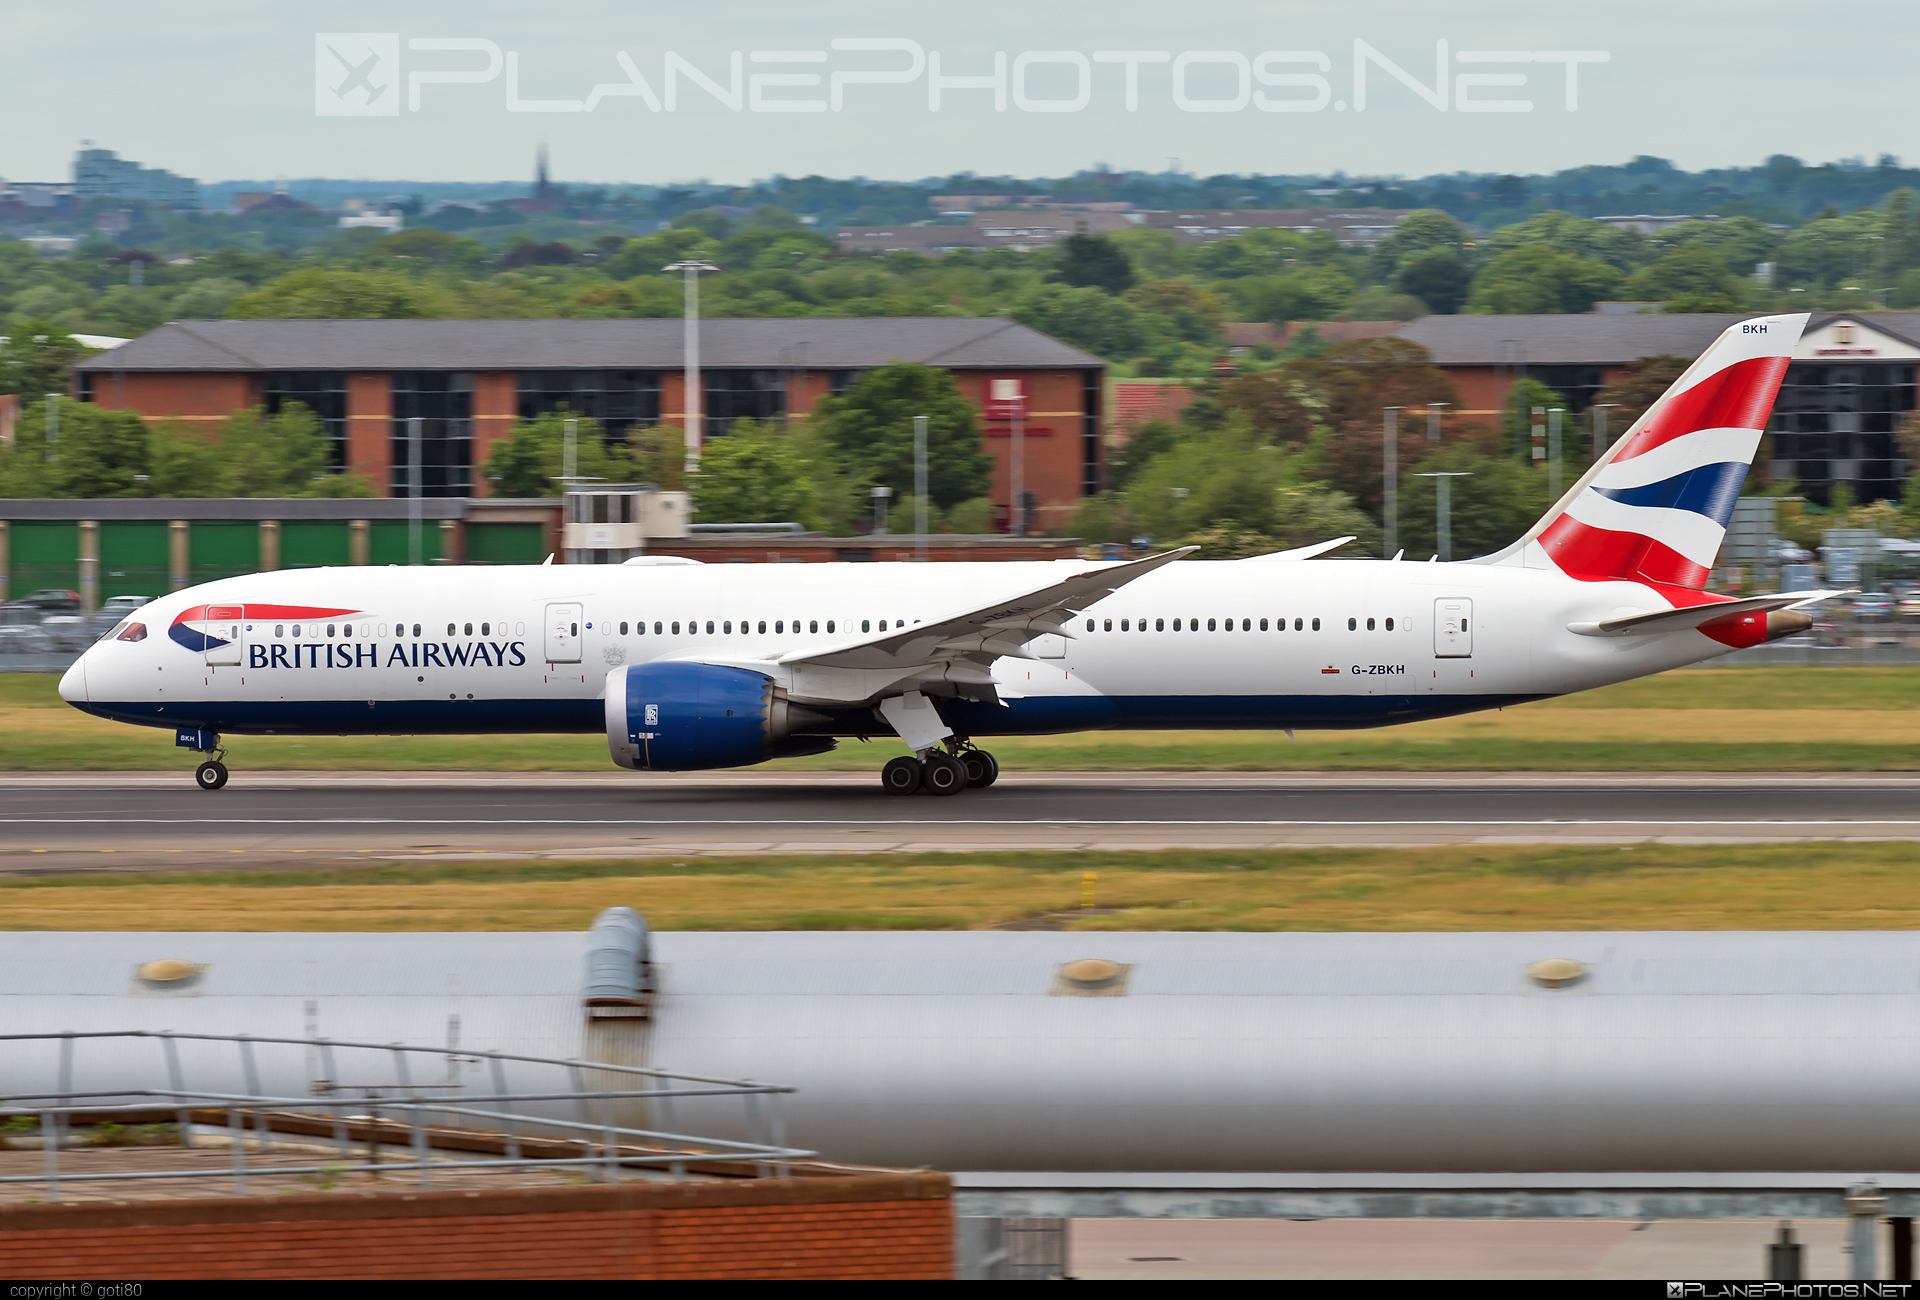 Boeing 787-9 Dreamliner - G-ZBKH operated by British Airways #b787 #boeing #boeing787 #britishairways #dreamliner